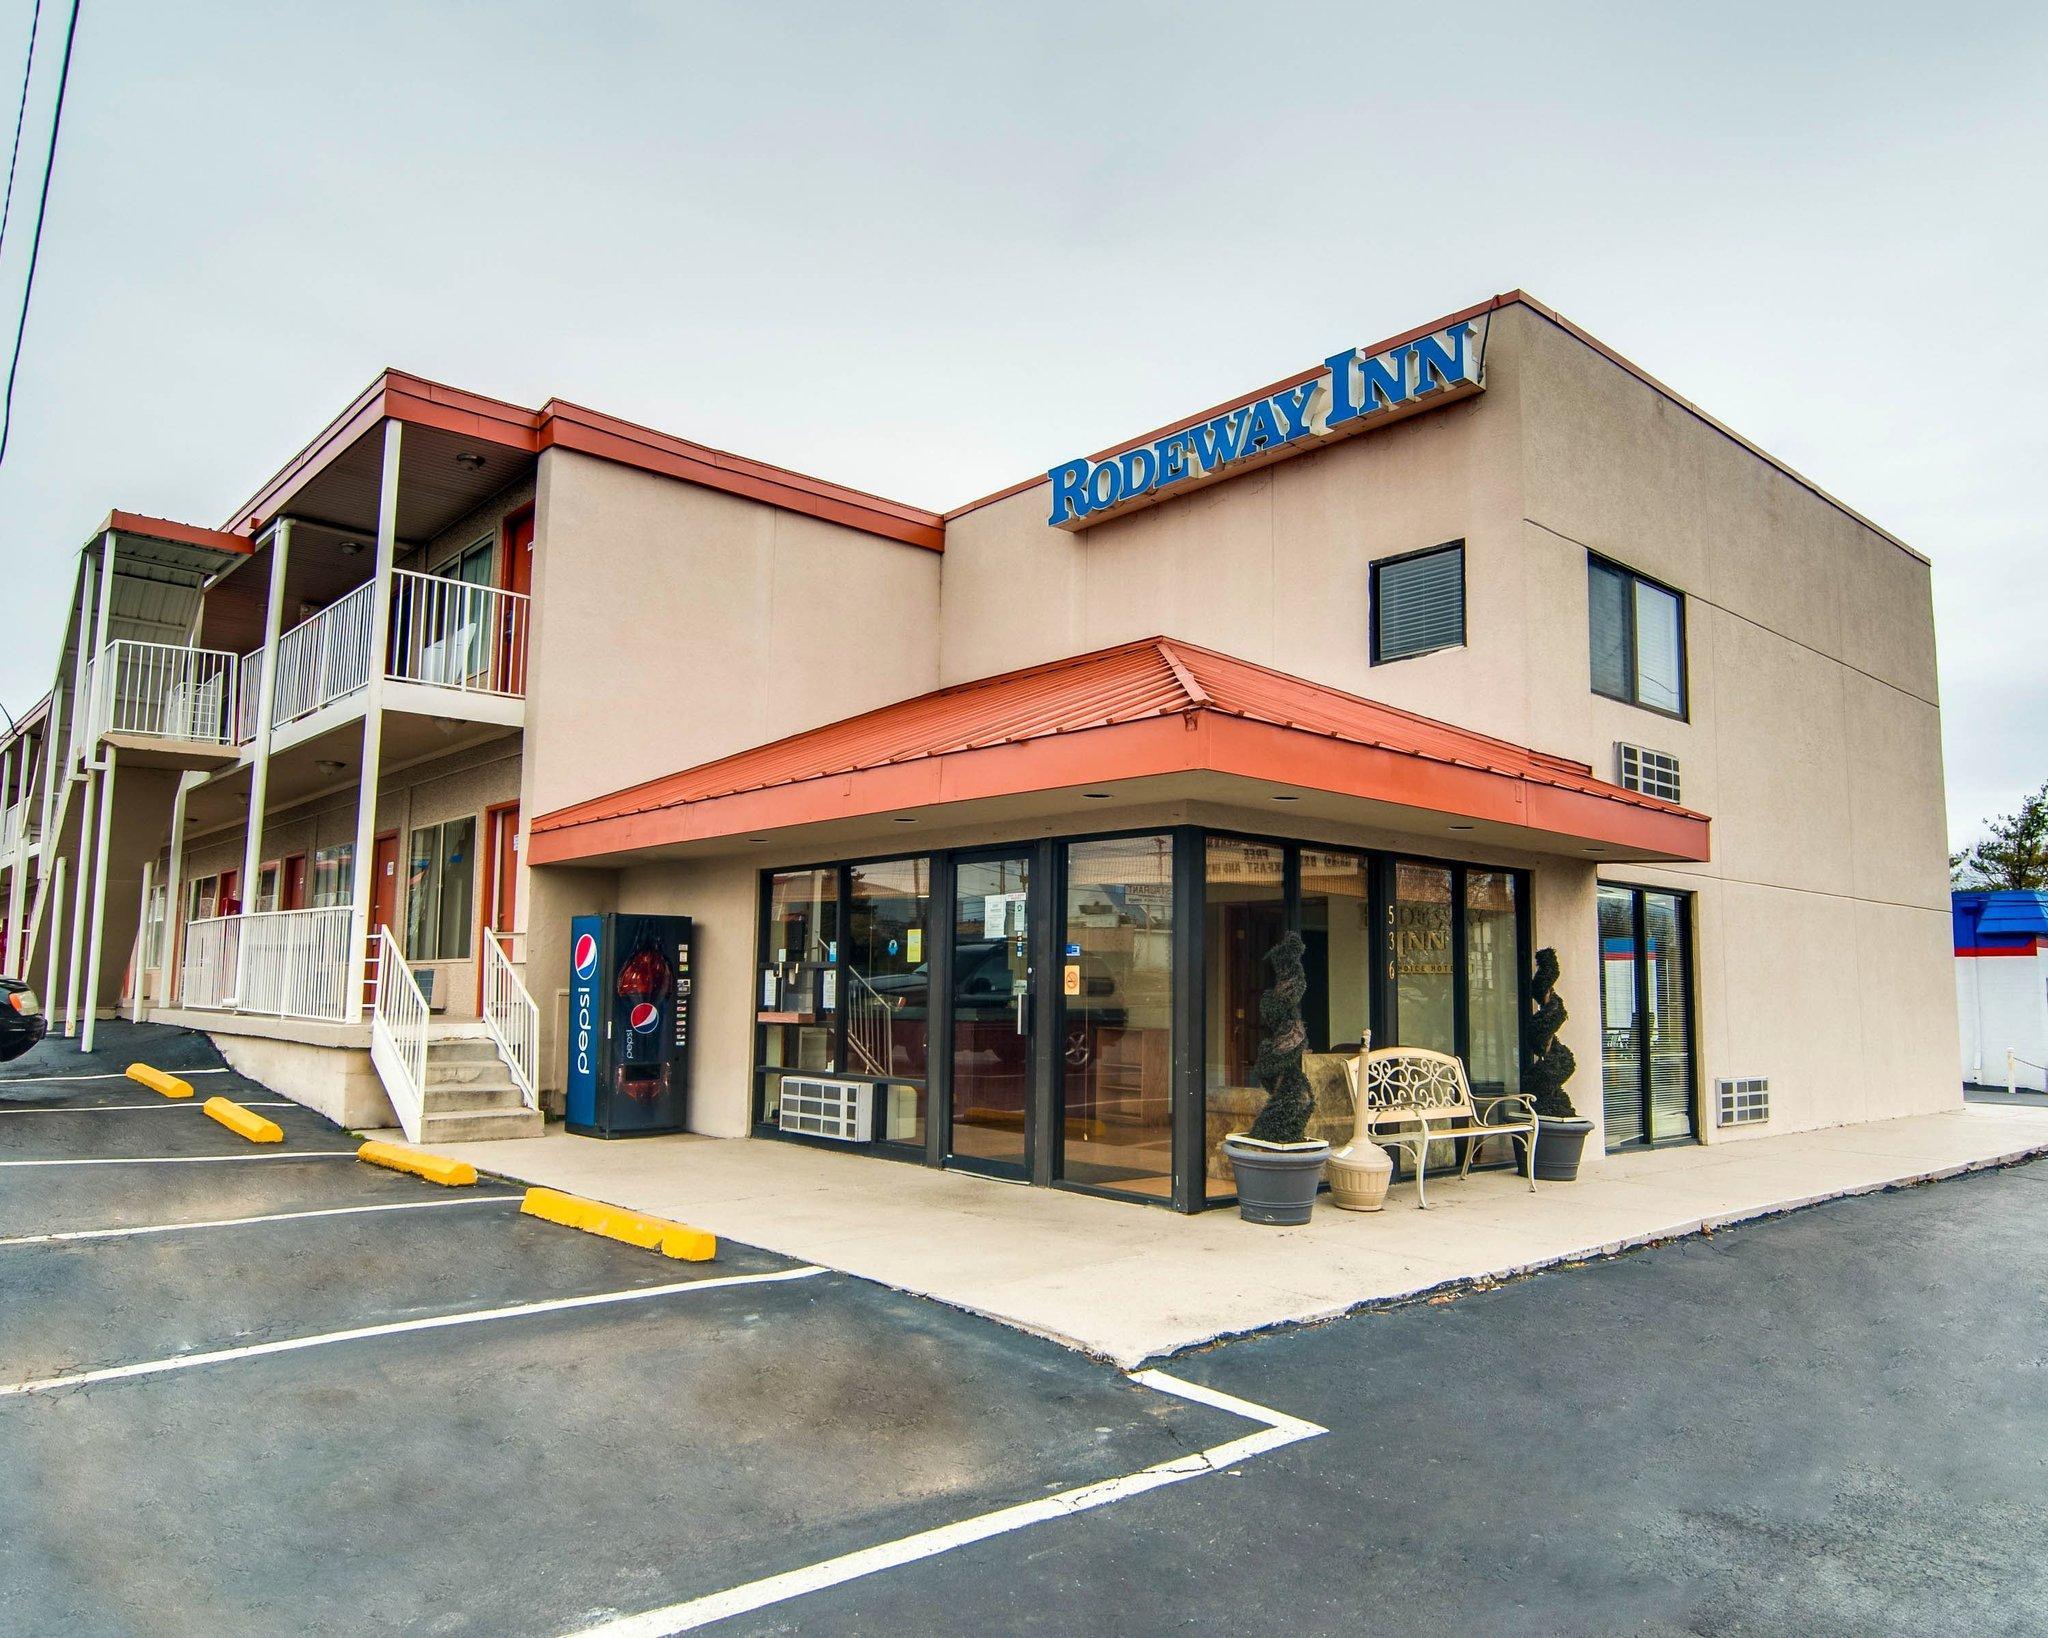 Rodeway Inn Civic Center